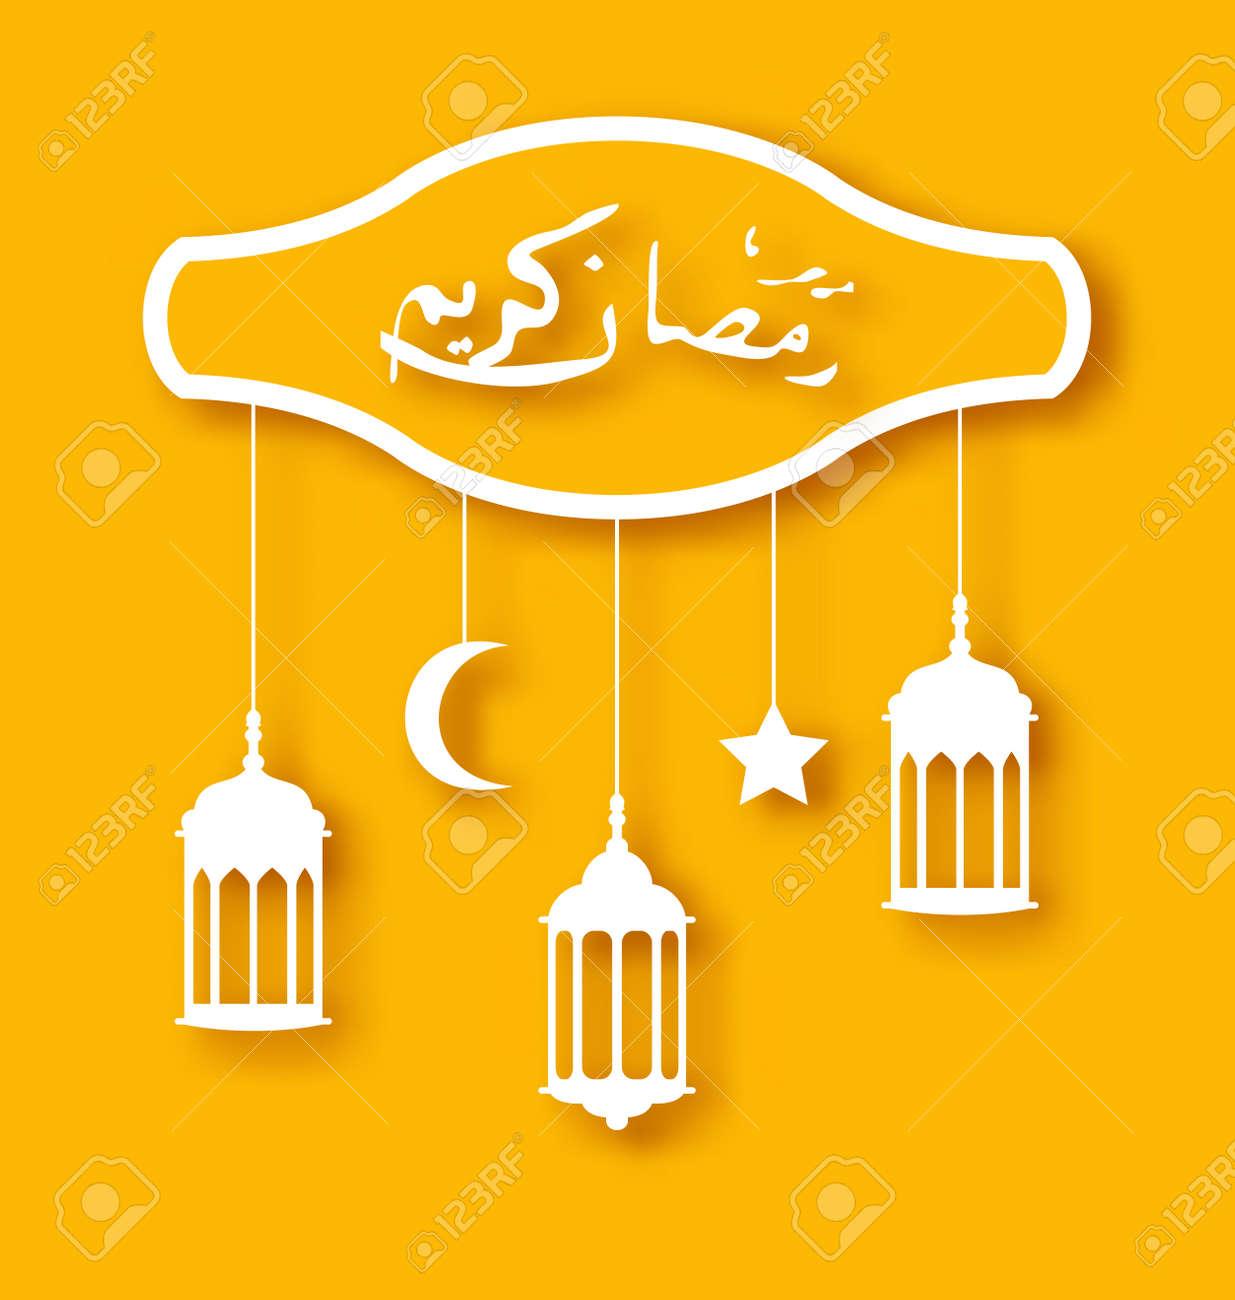 Illustration Eid Mubarak Greeting Card With Islamic Elements